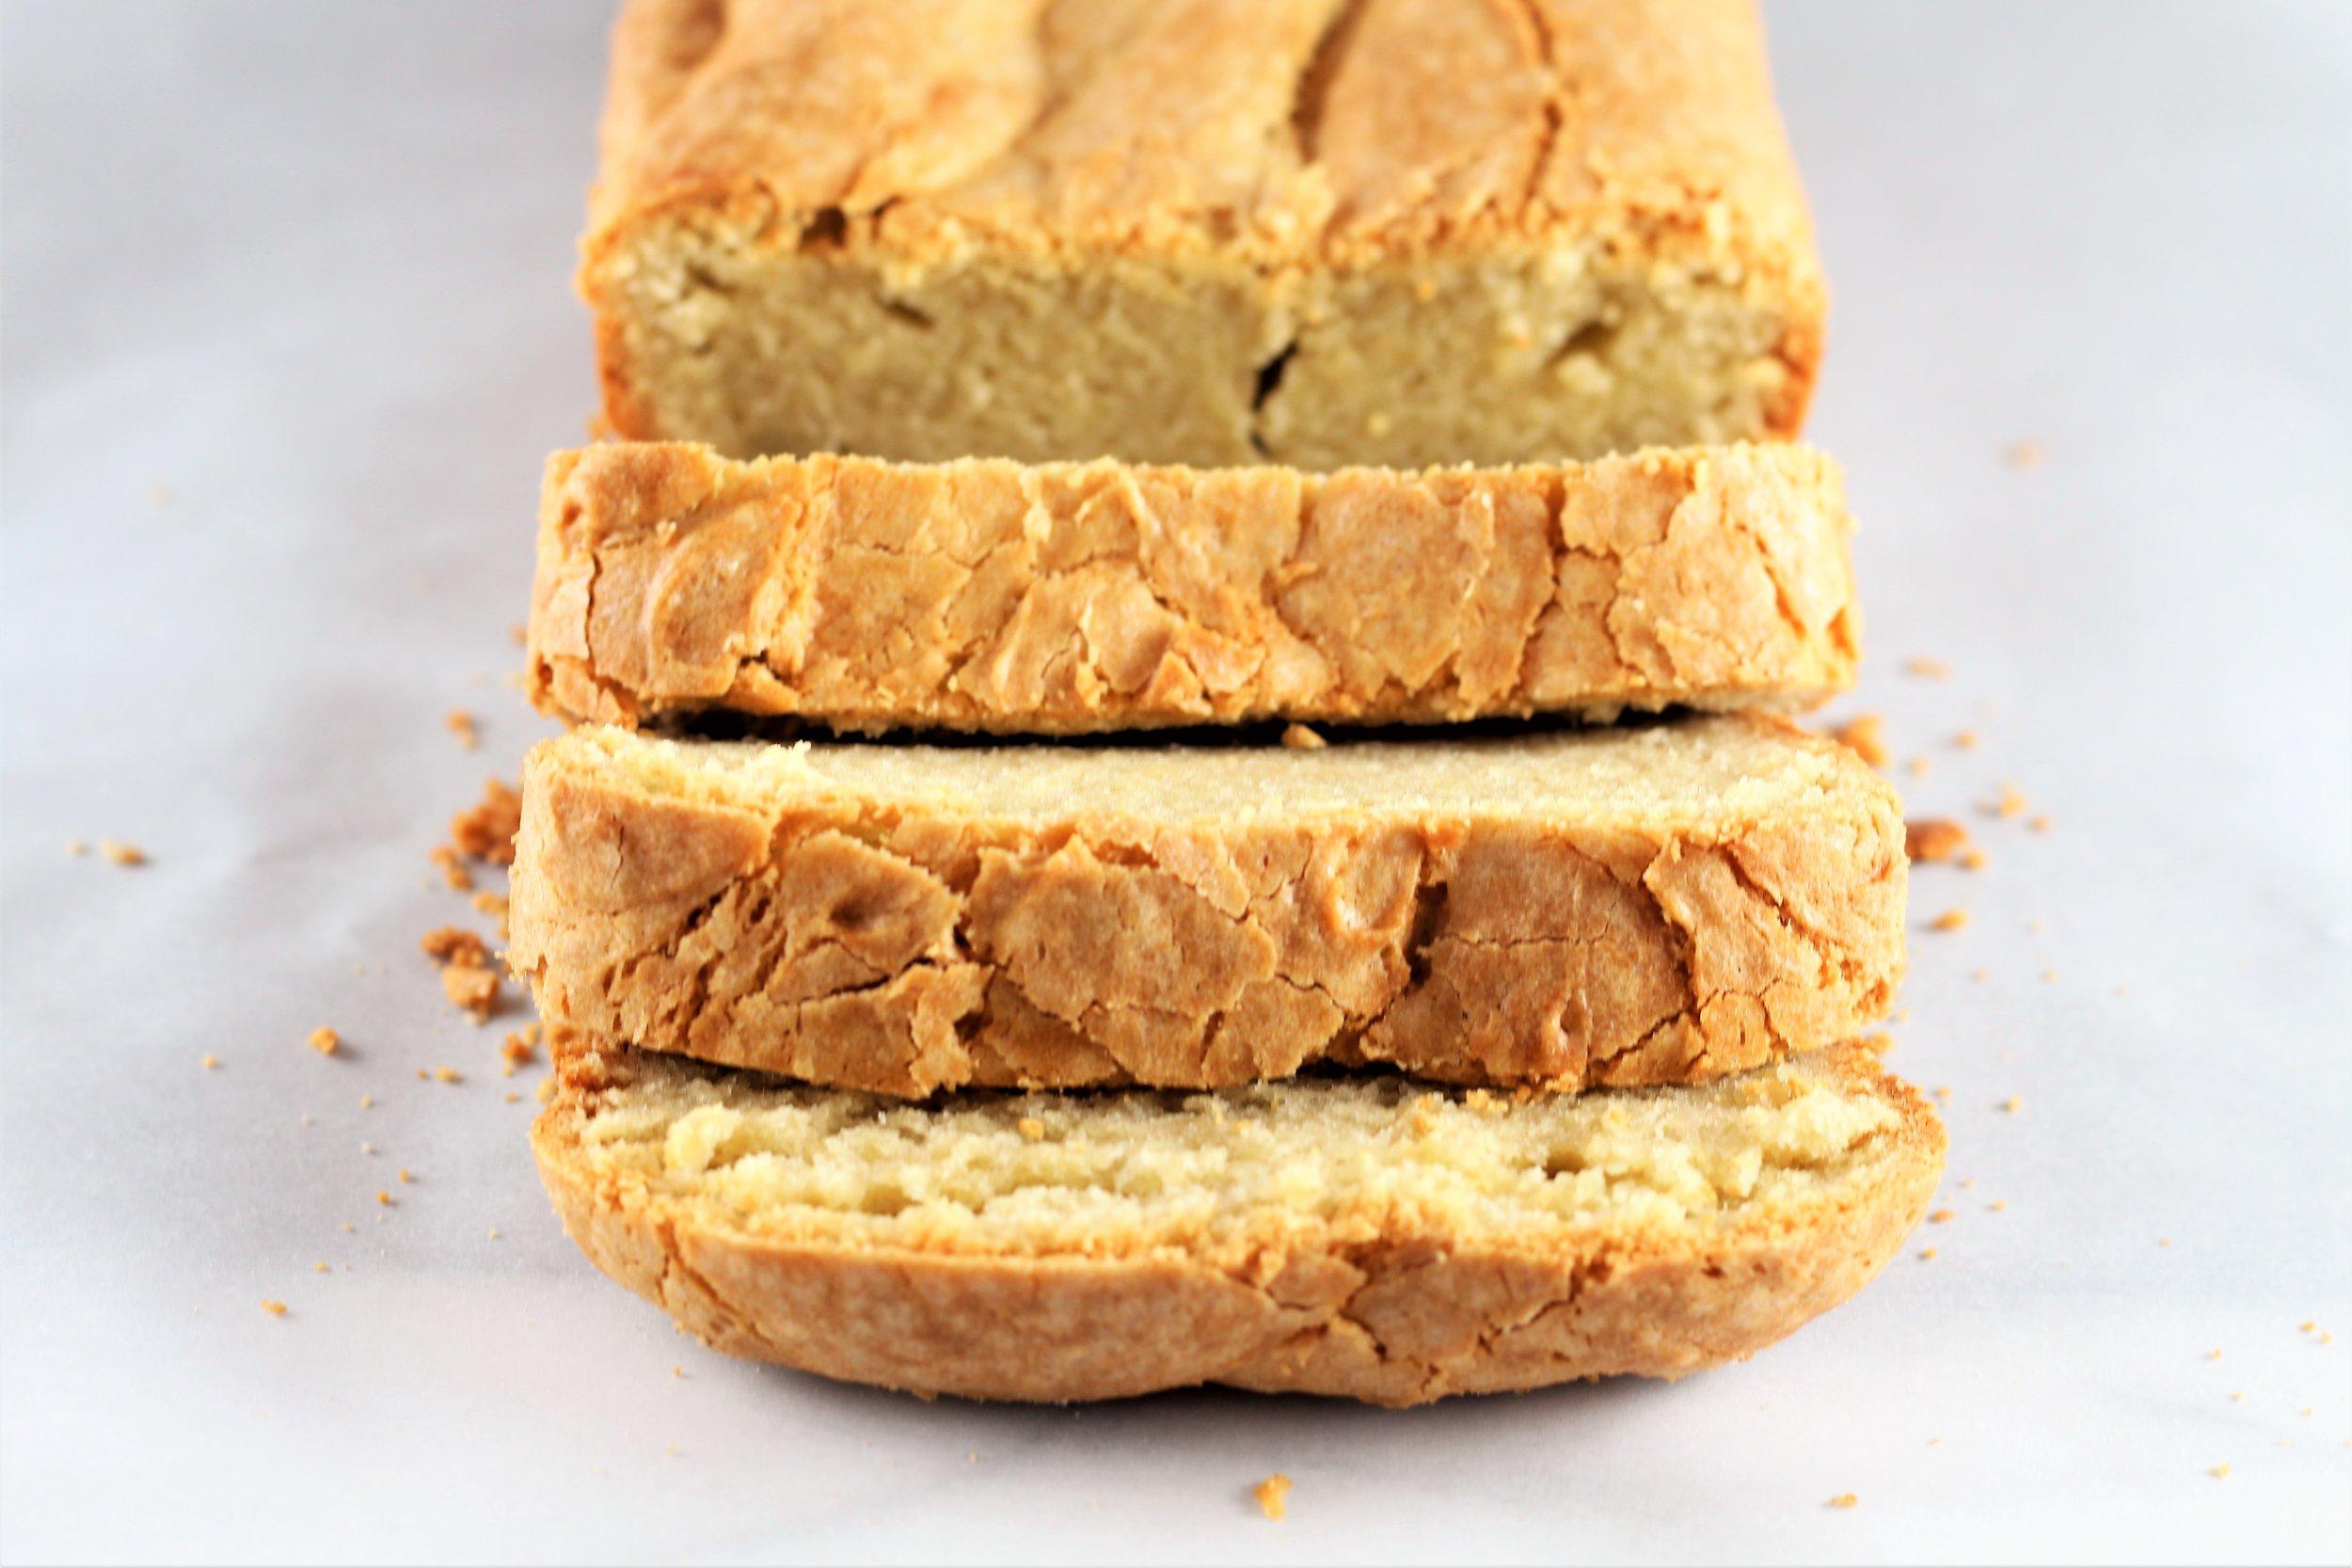 Grandma's Almond Poundcake